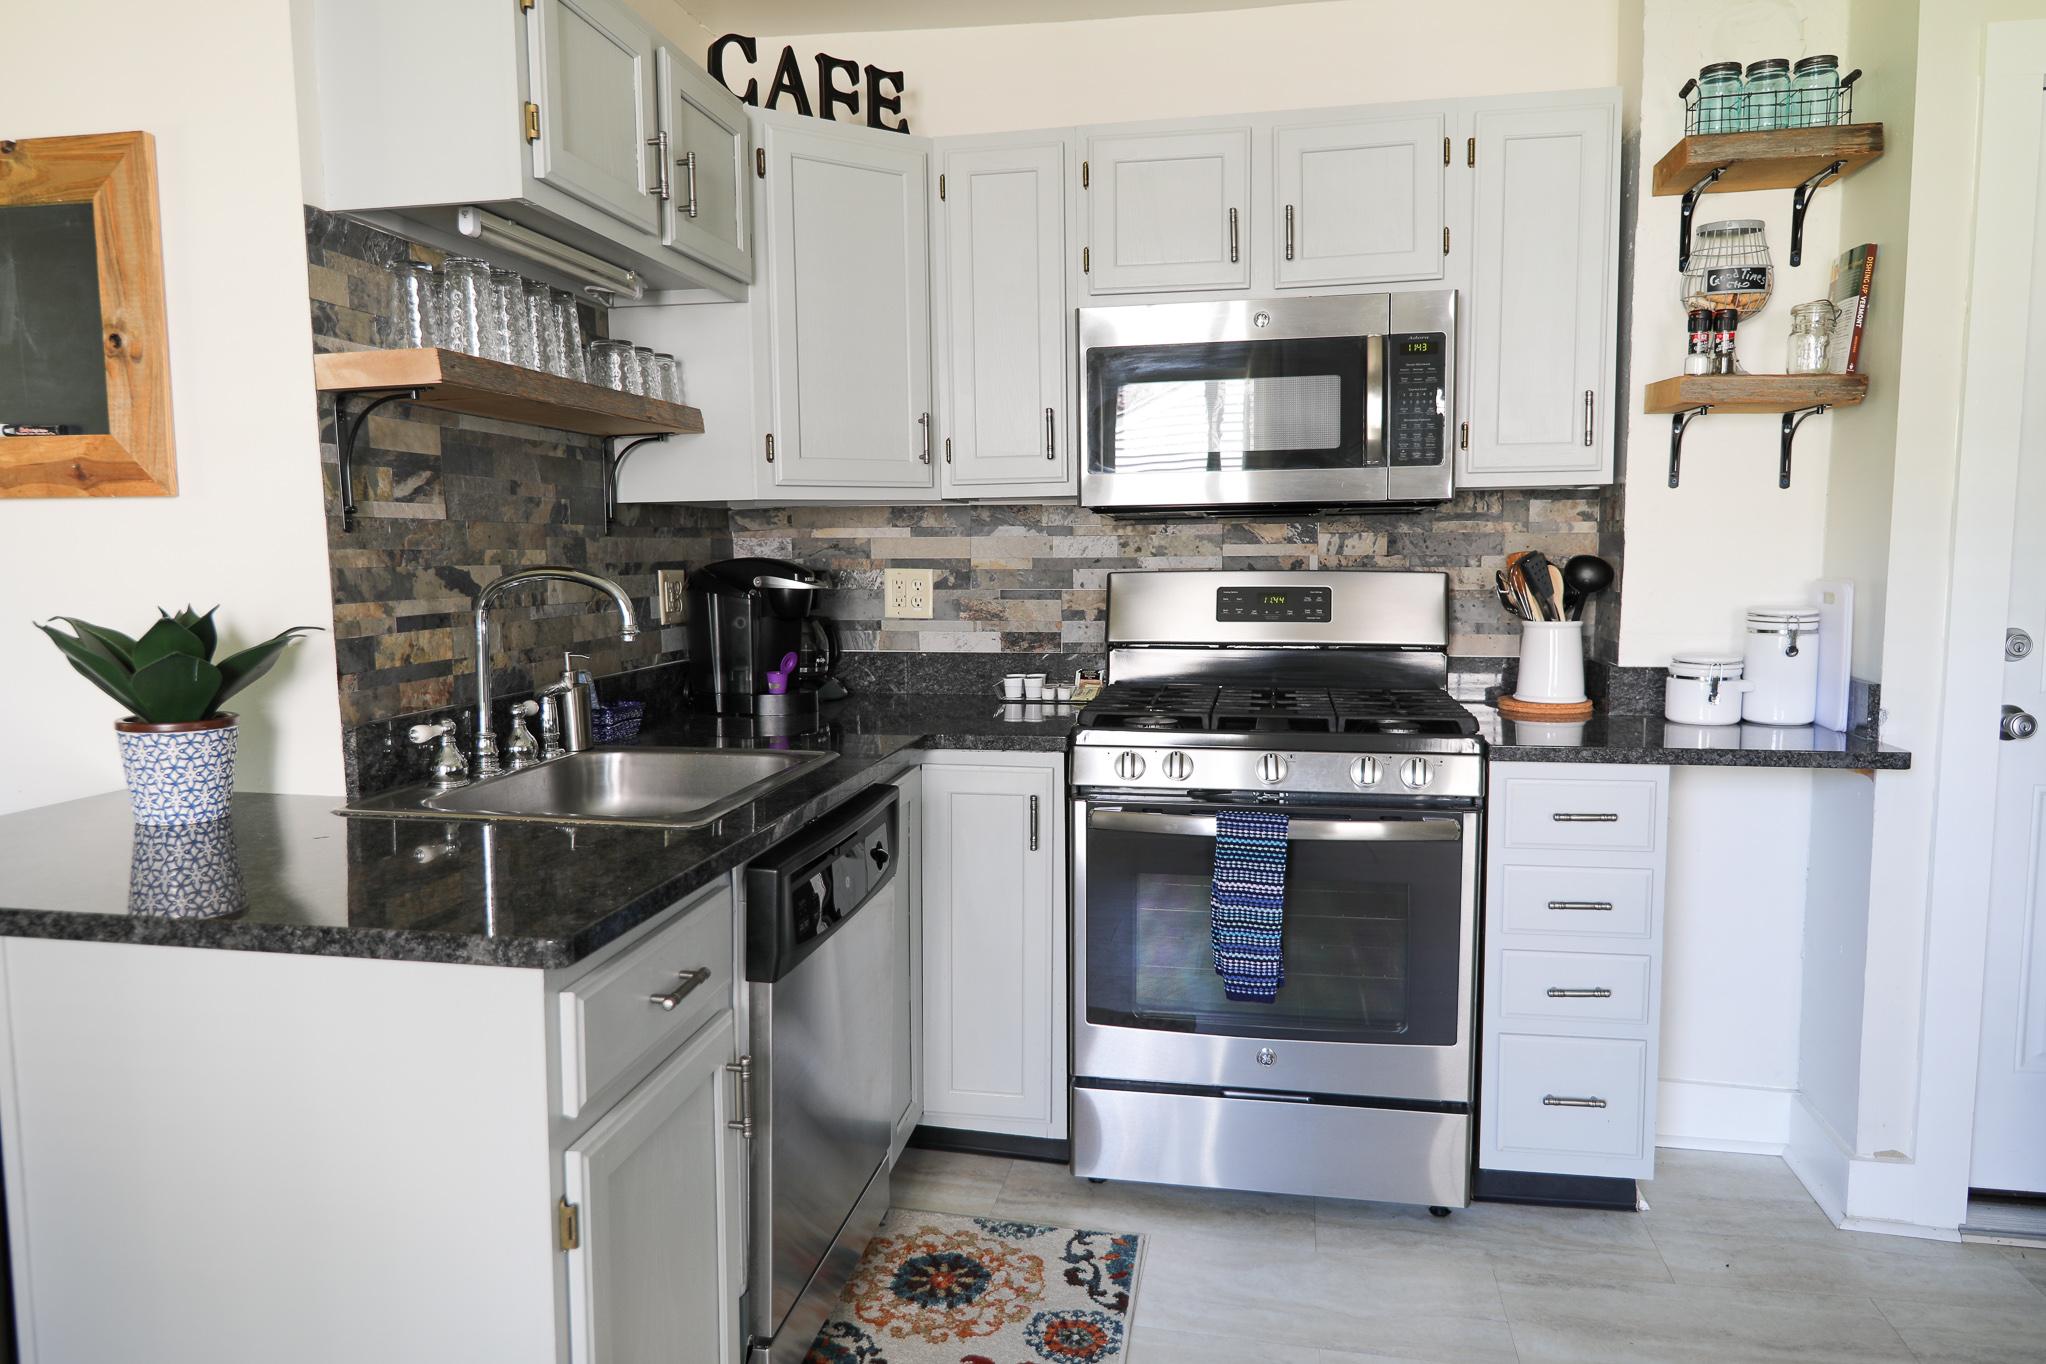 gorgeous kitchen open shelving ideas with reclaimed wood #reclaimedwood #shelvingideas